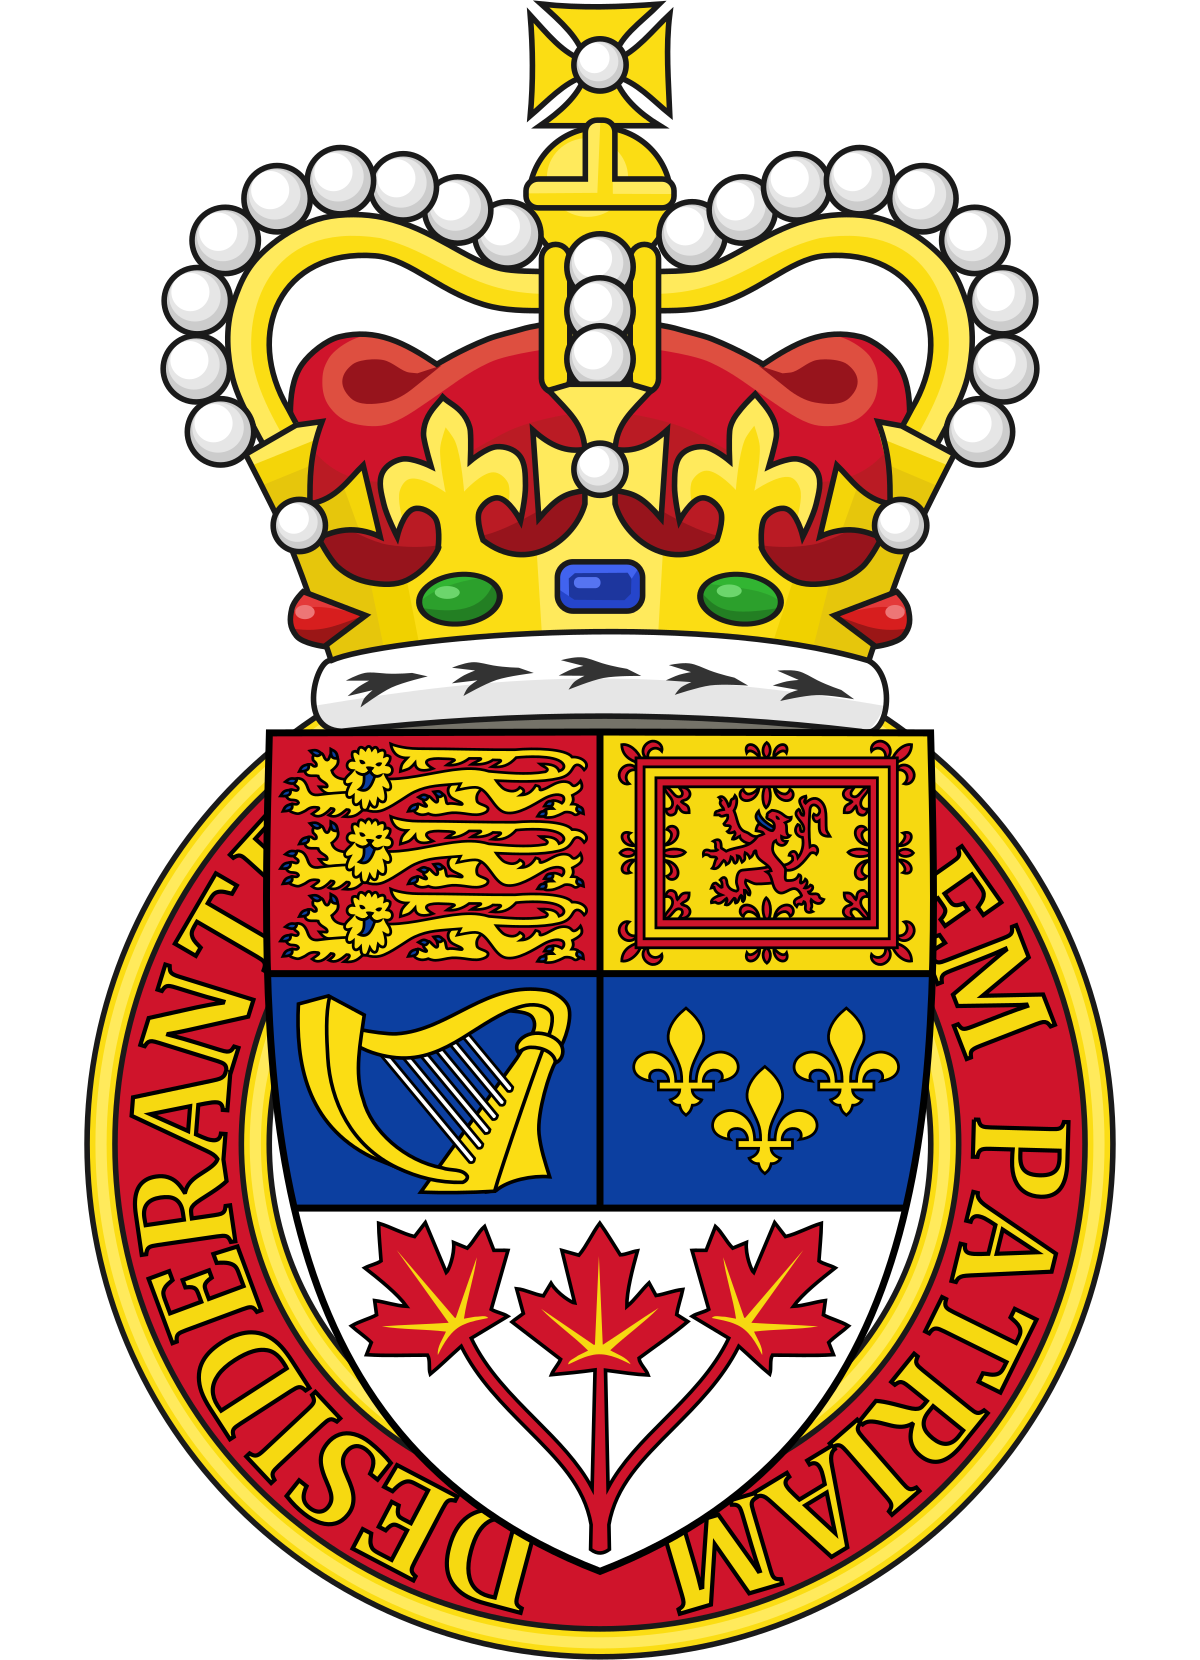 Canadian heraldry wikipedia . Shell clipart heraldic scallop